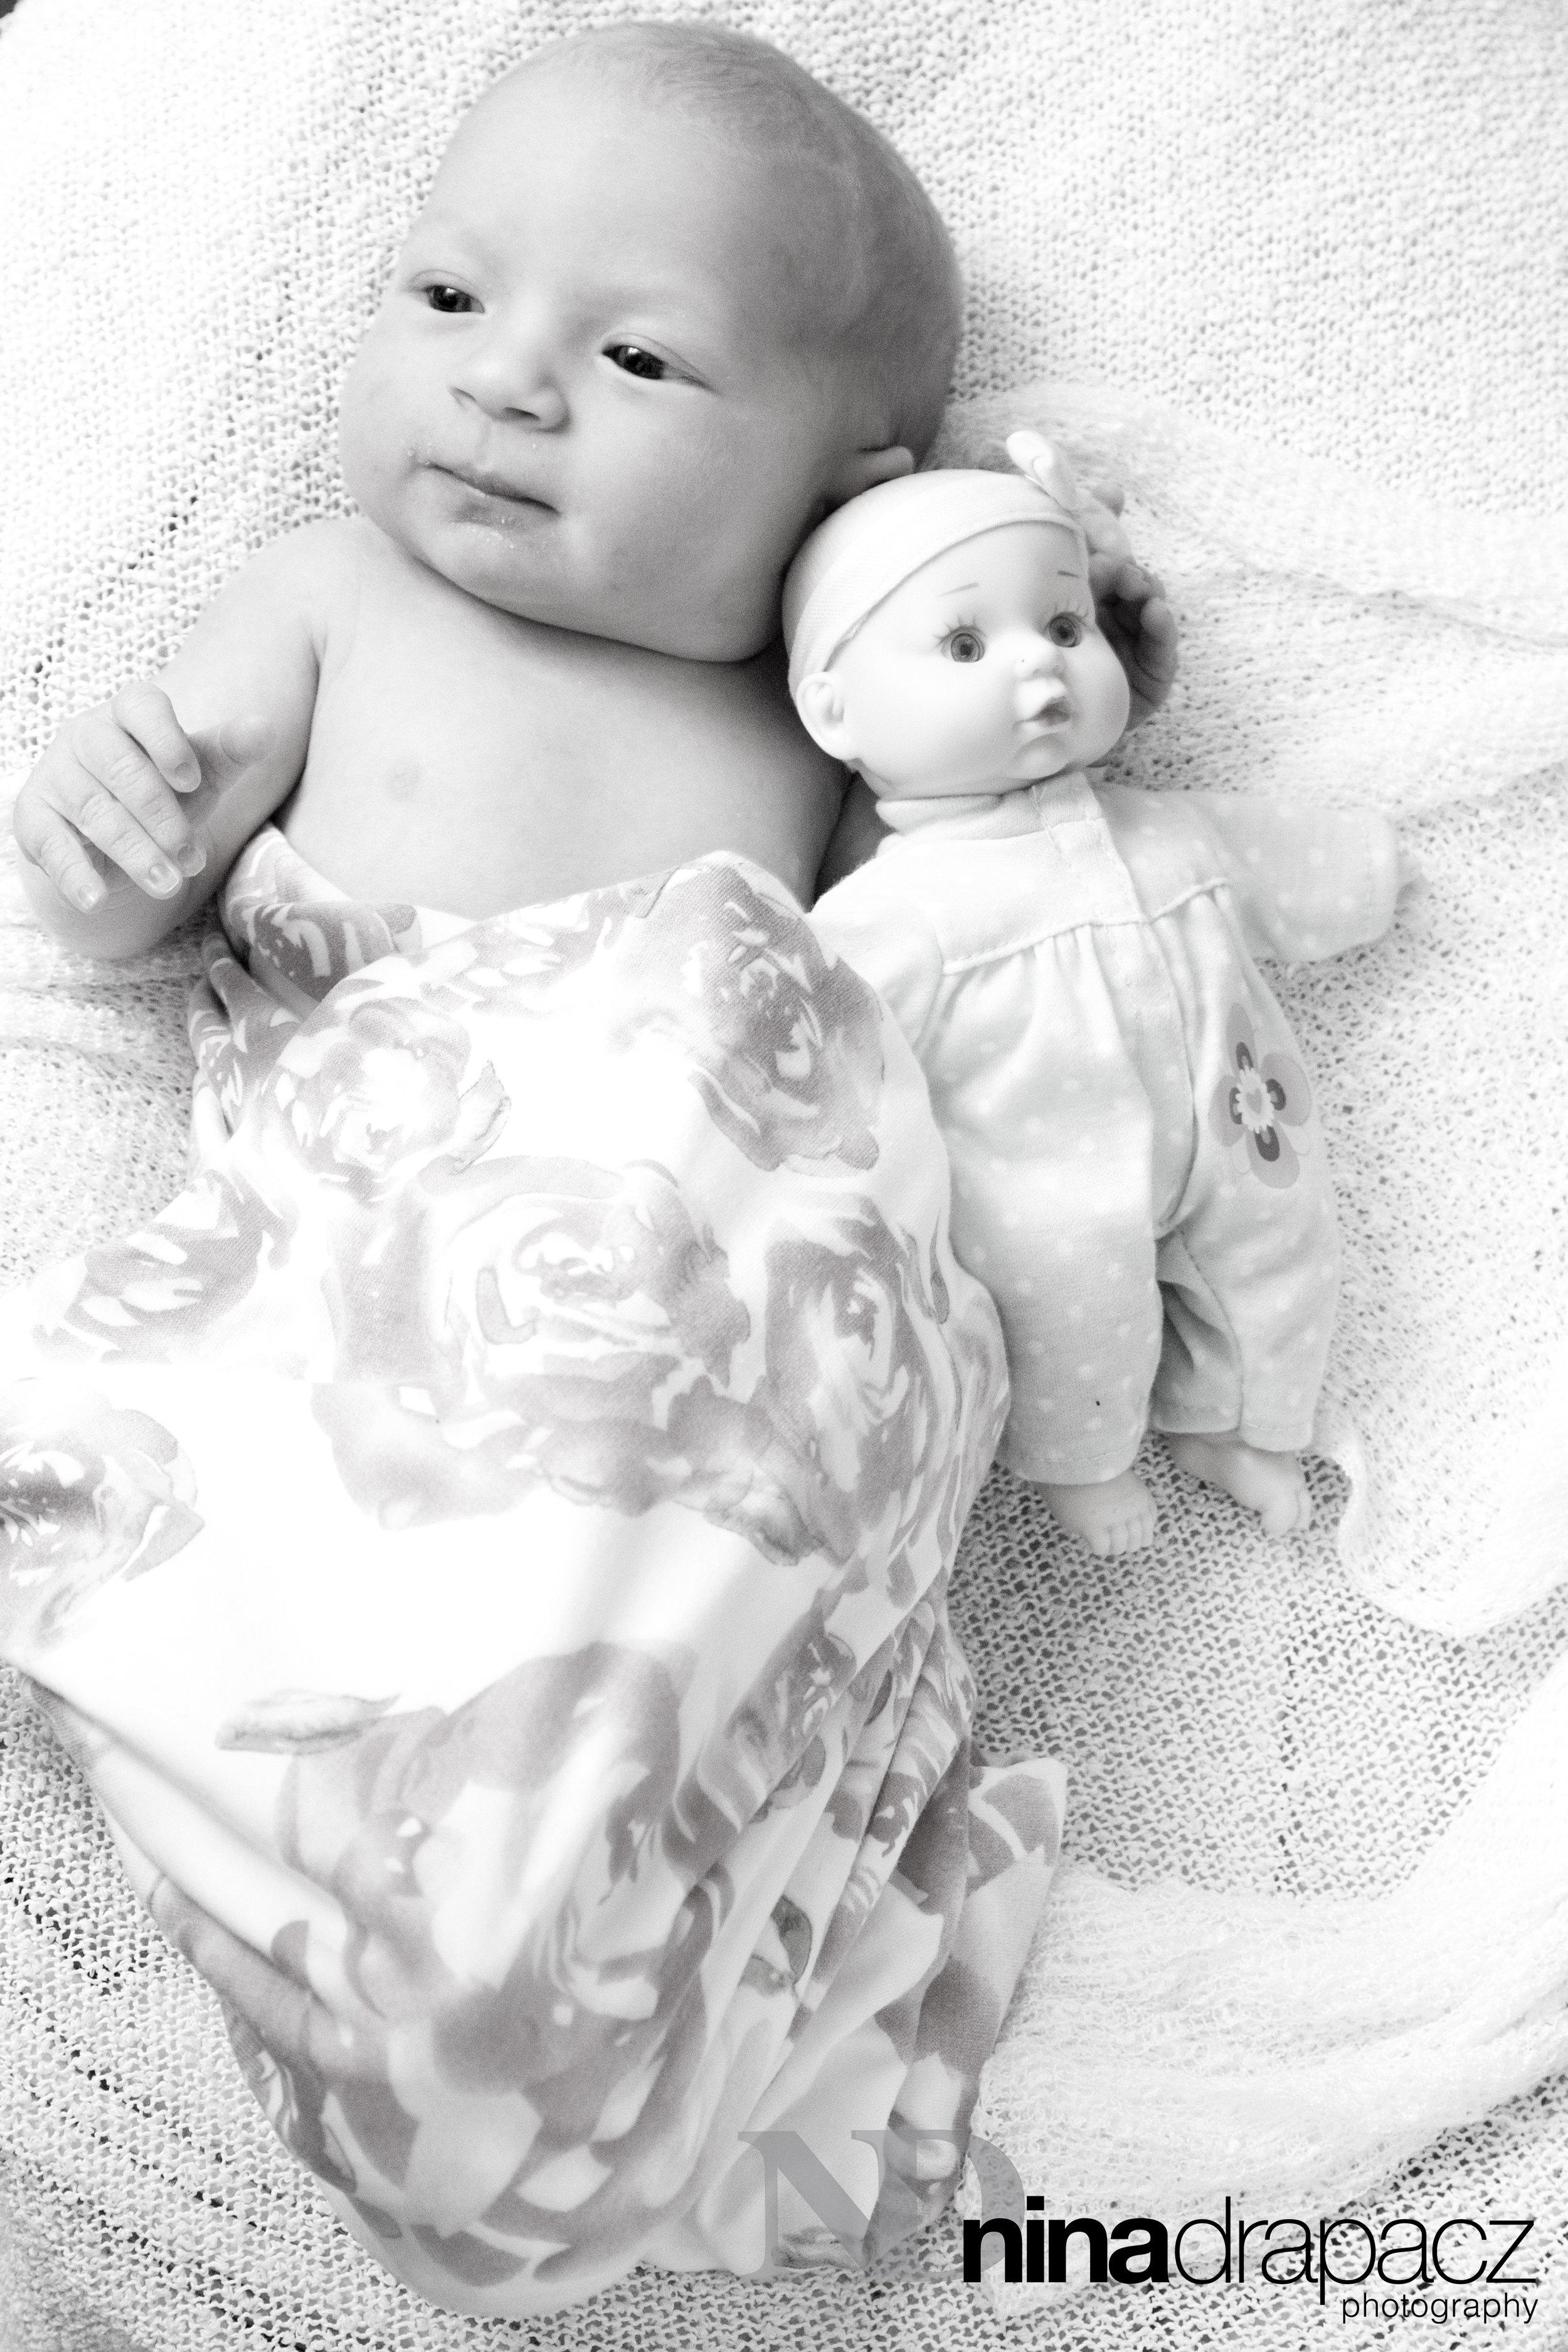 newbornwithdoll.jpg